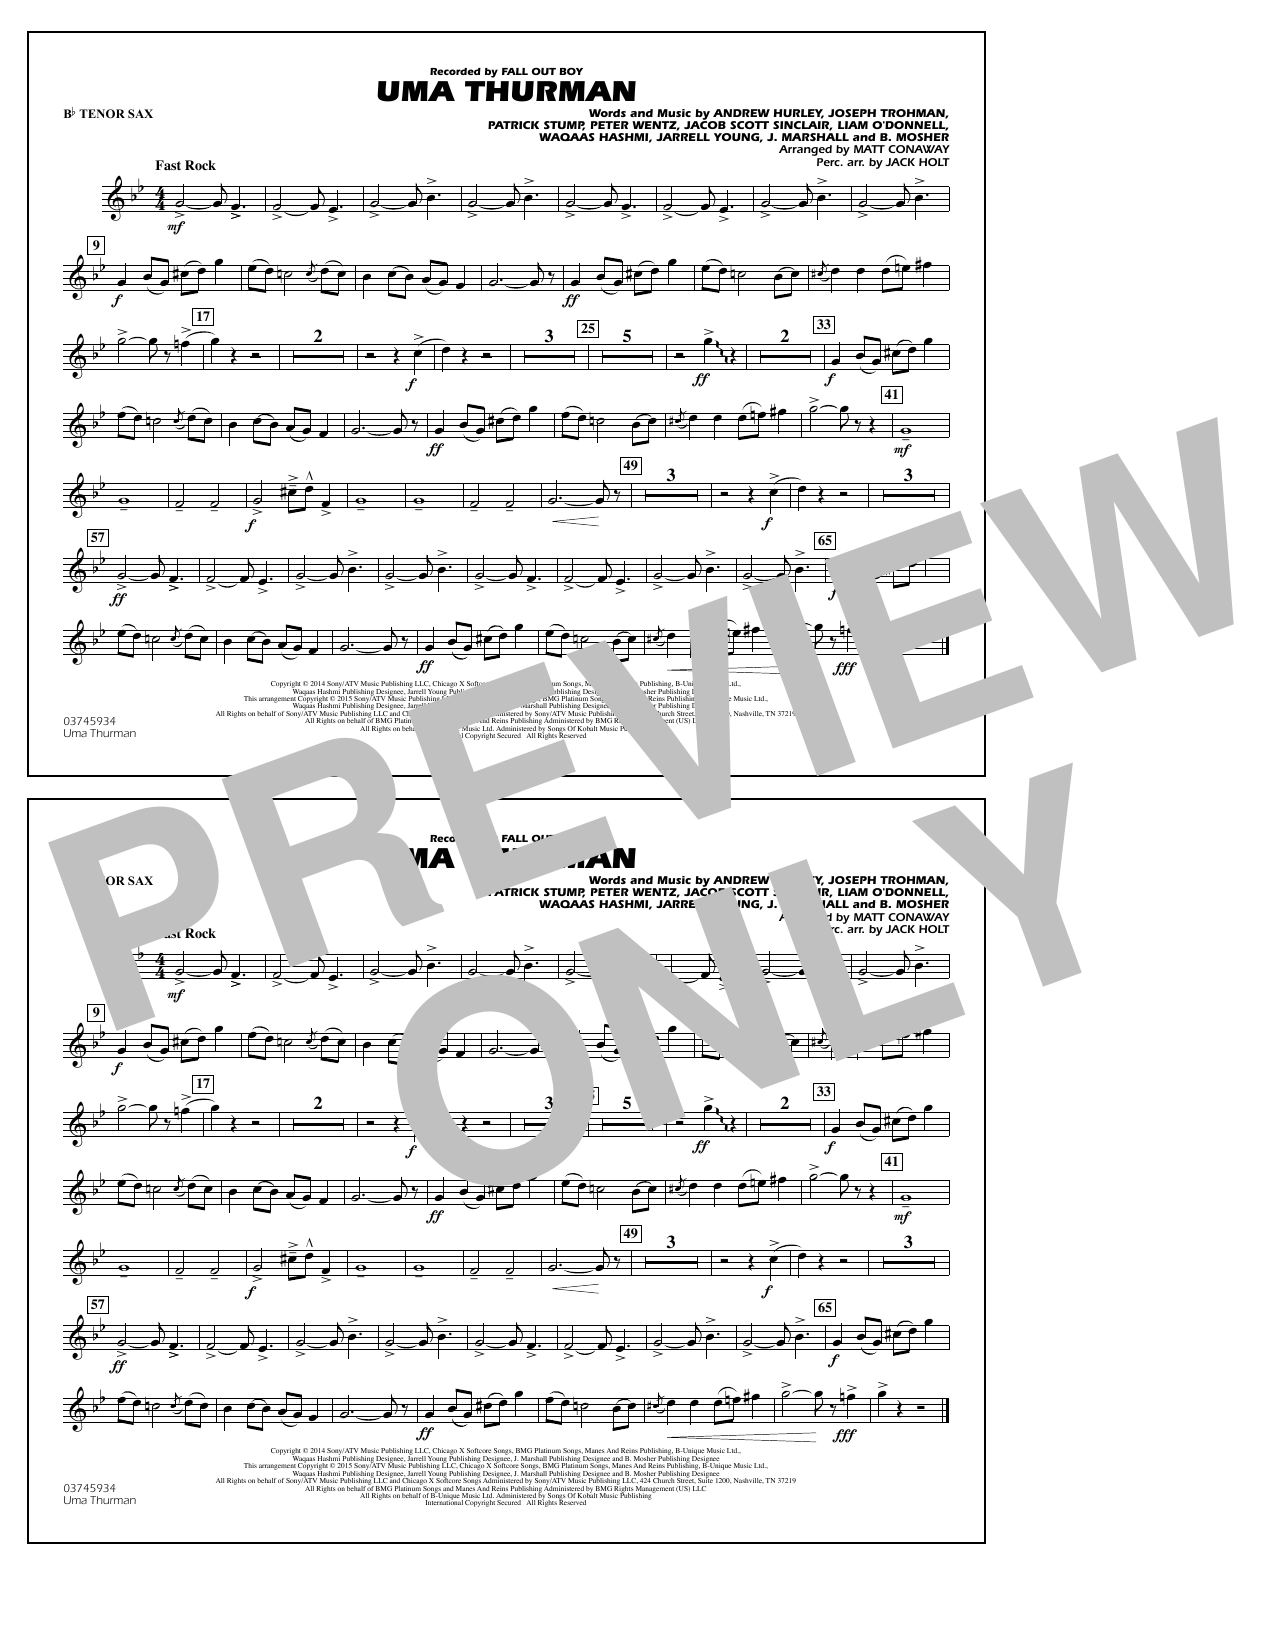 Uma Thurman - Bb Tenor Sax (Marching Band)